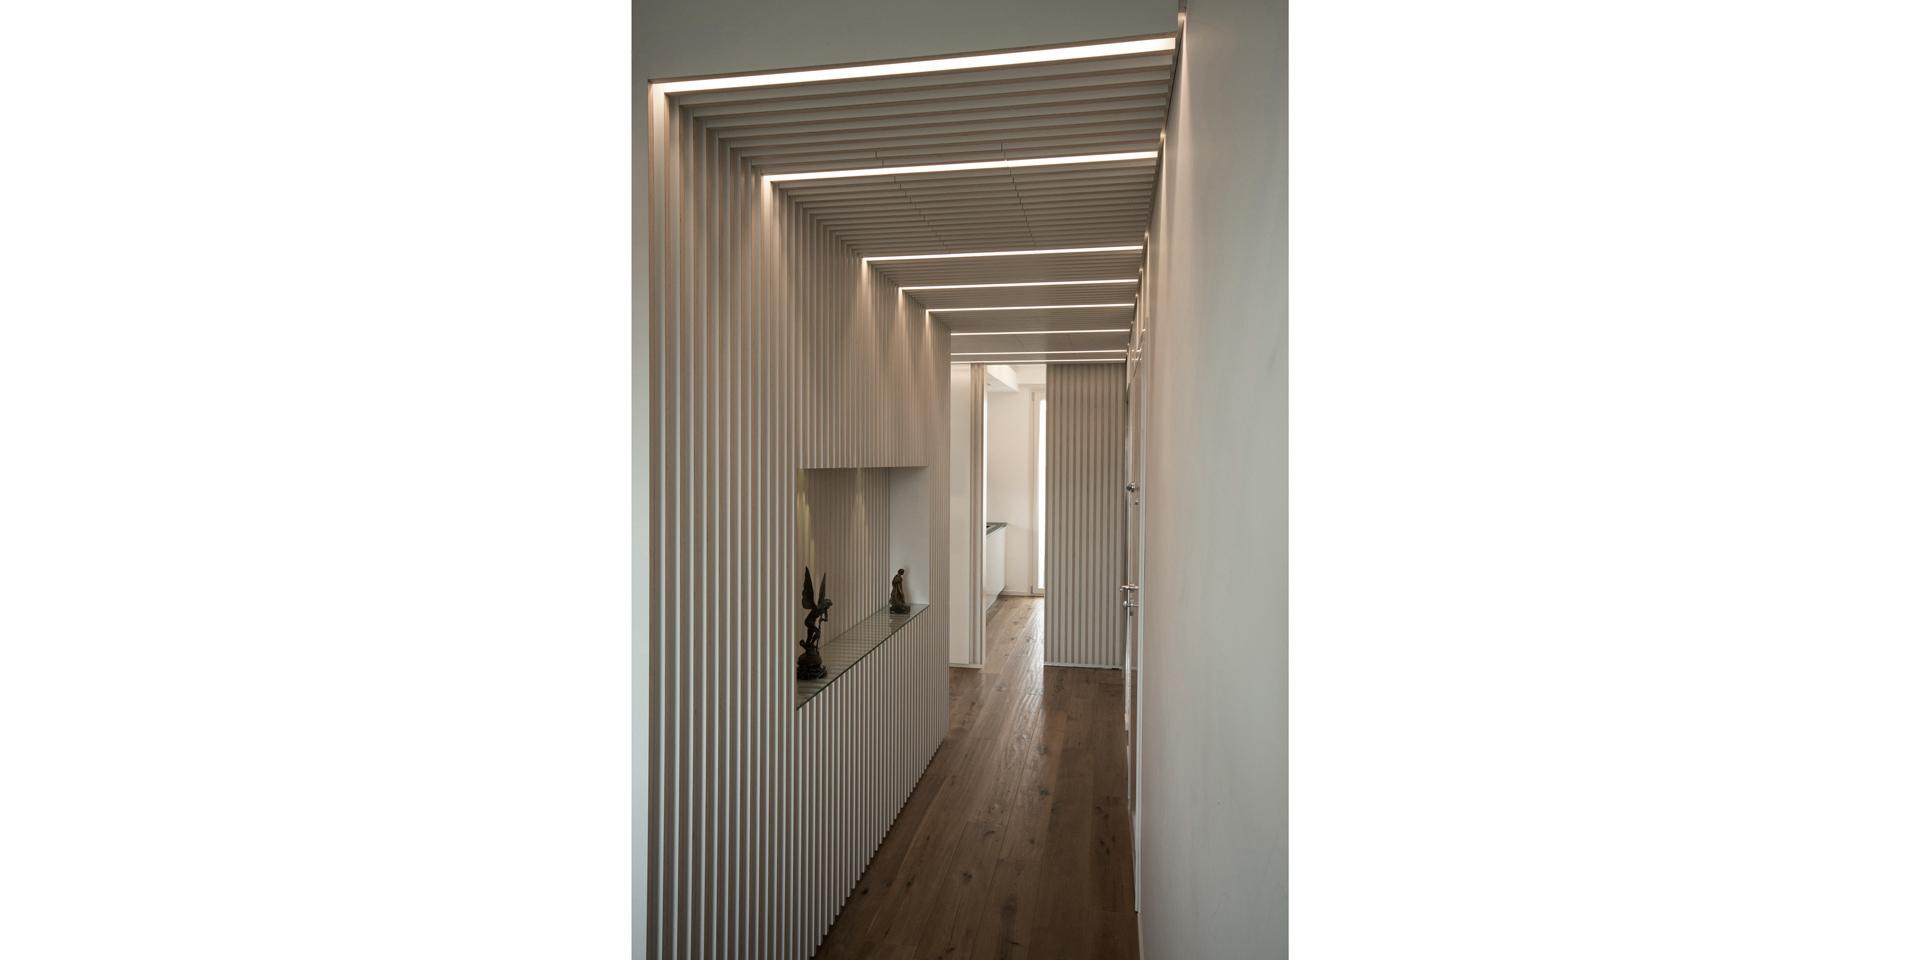 archinow_BVR_-residenza-privata-09